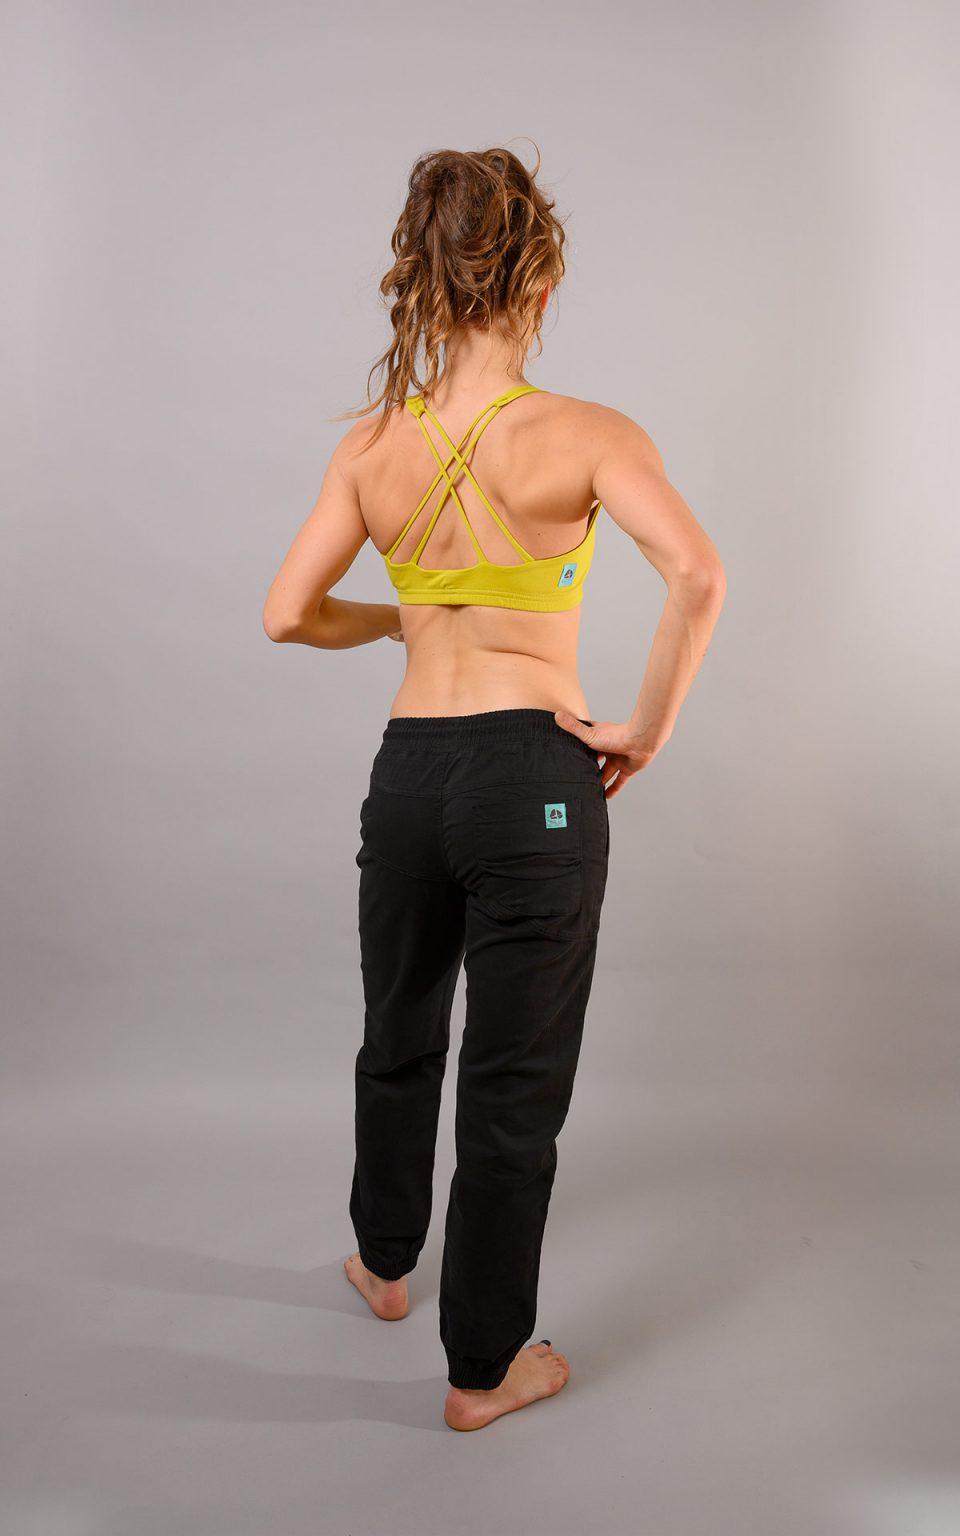 Double Cross bra top - lime